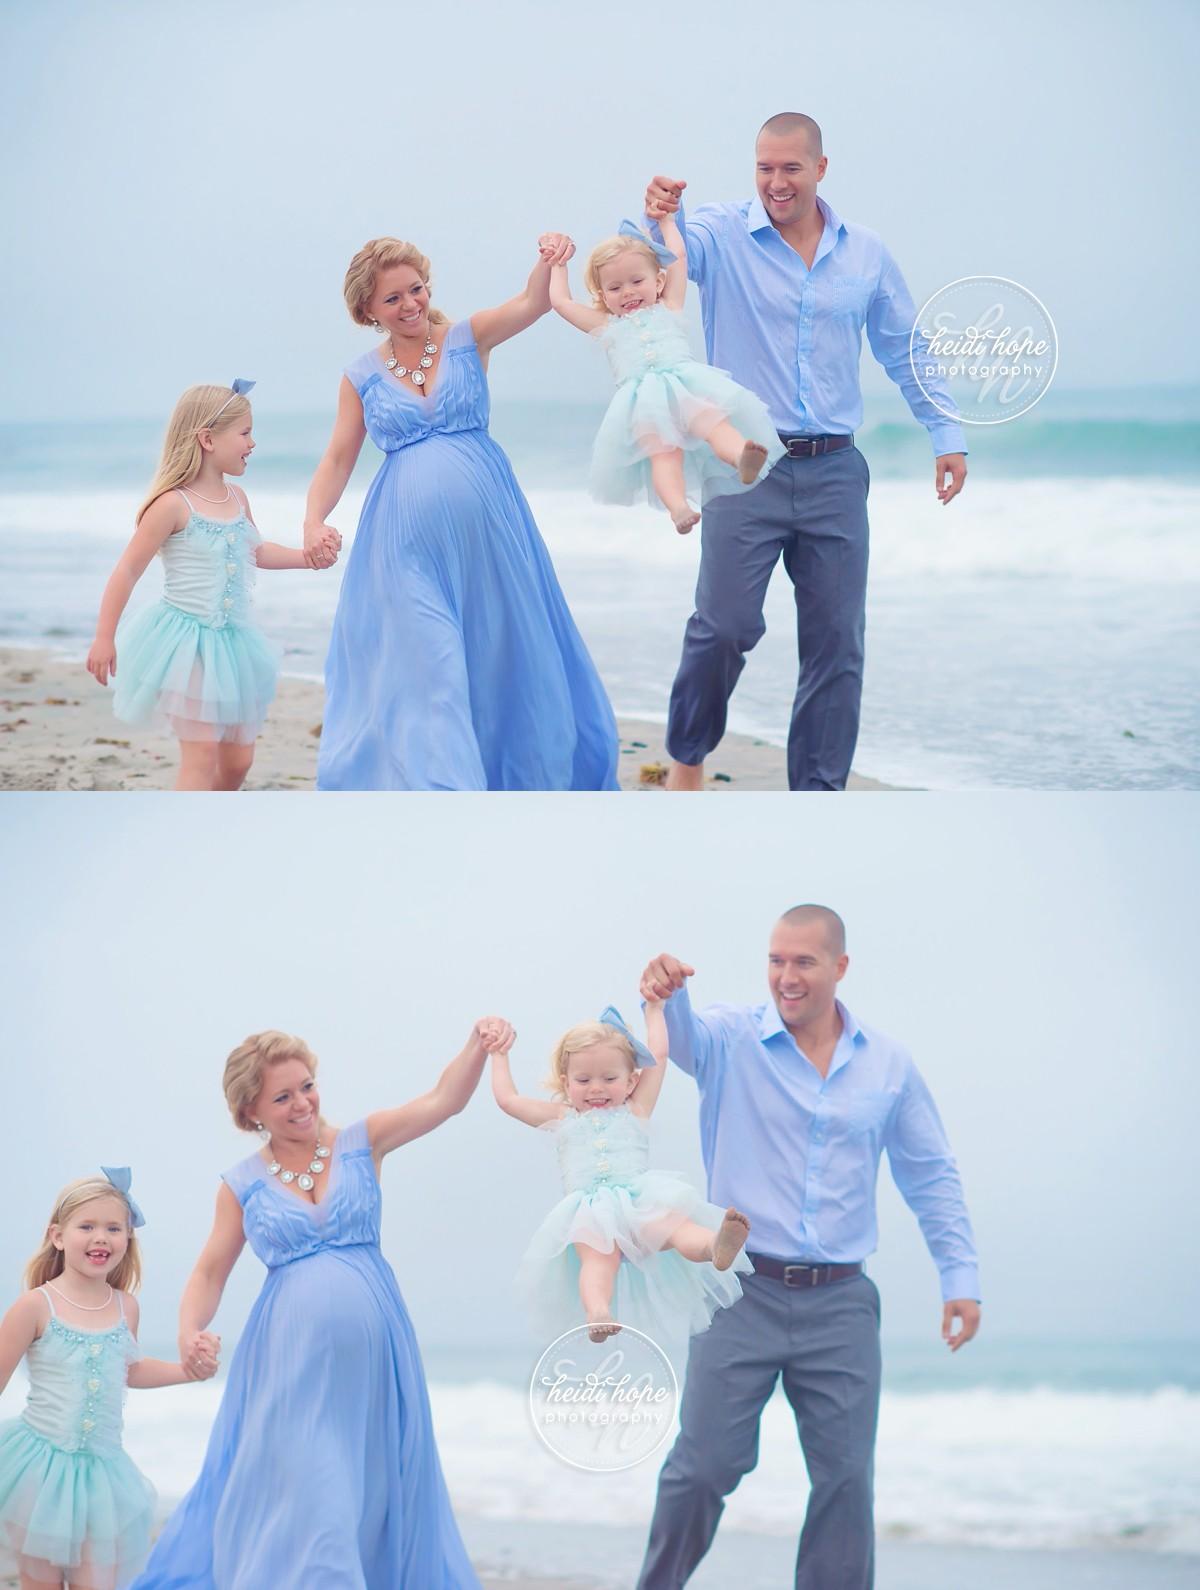 newport_rhode_island_maternity_photographer_portraits_on_the_beach_009